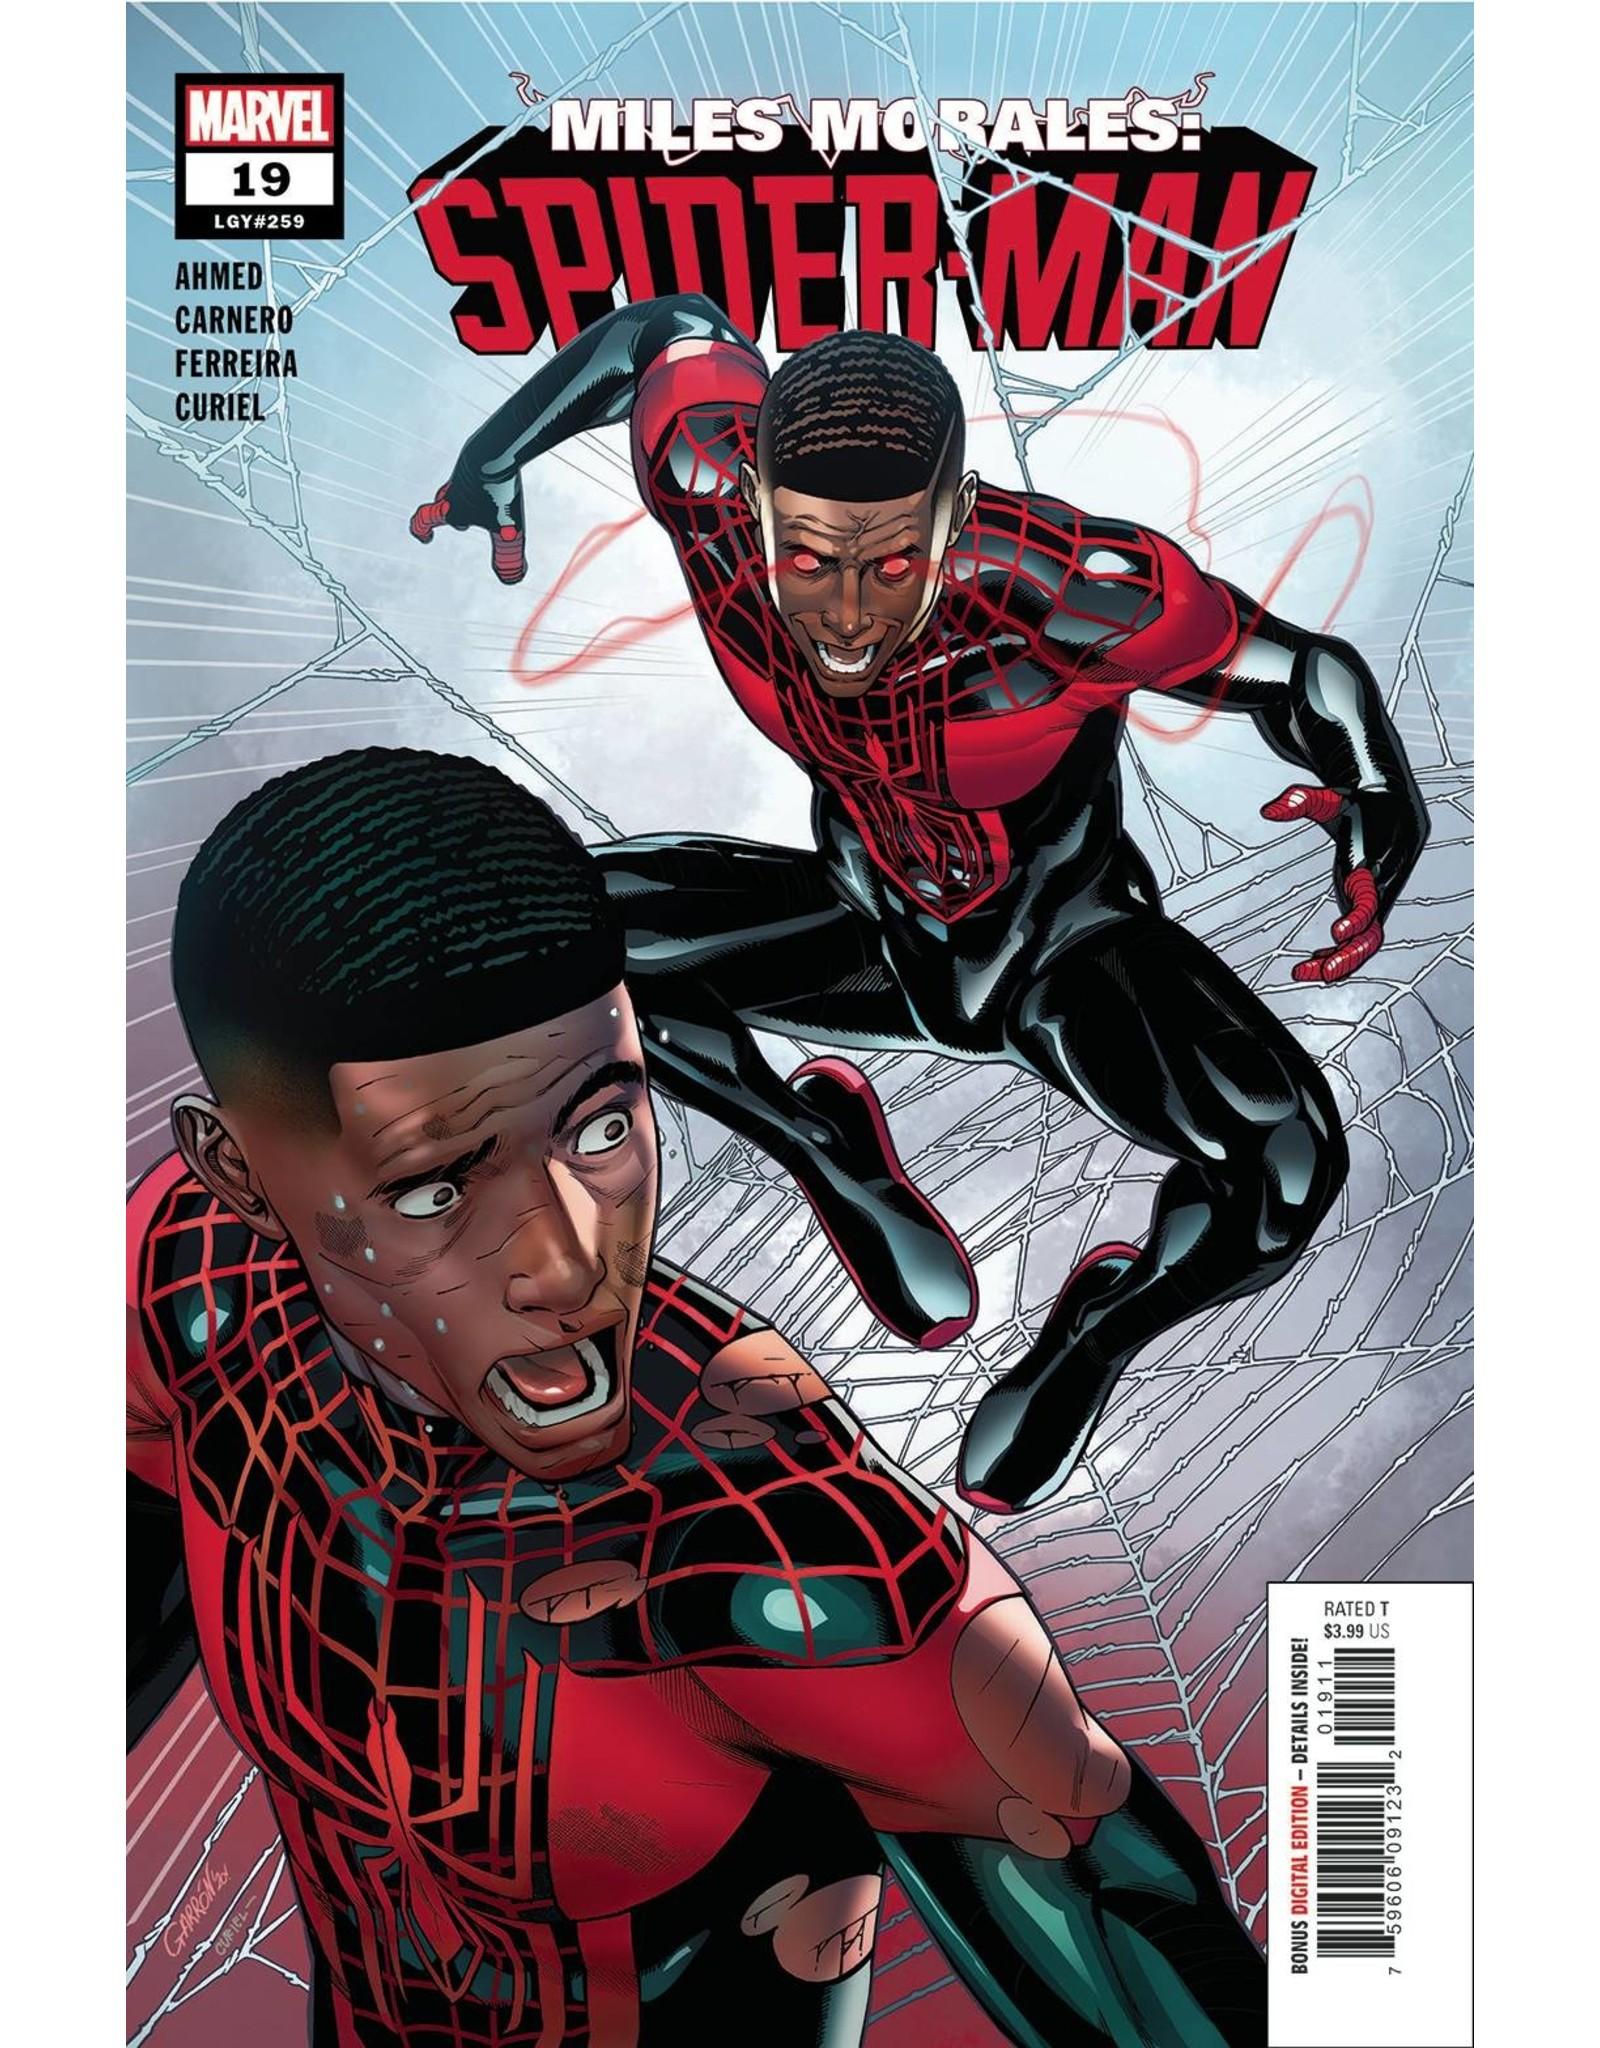 MARVEL COMICS MILES MORALES SPIDER-MAN #19 OUT